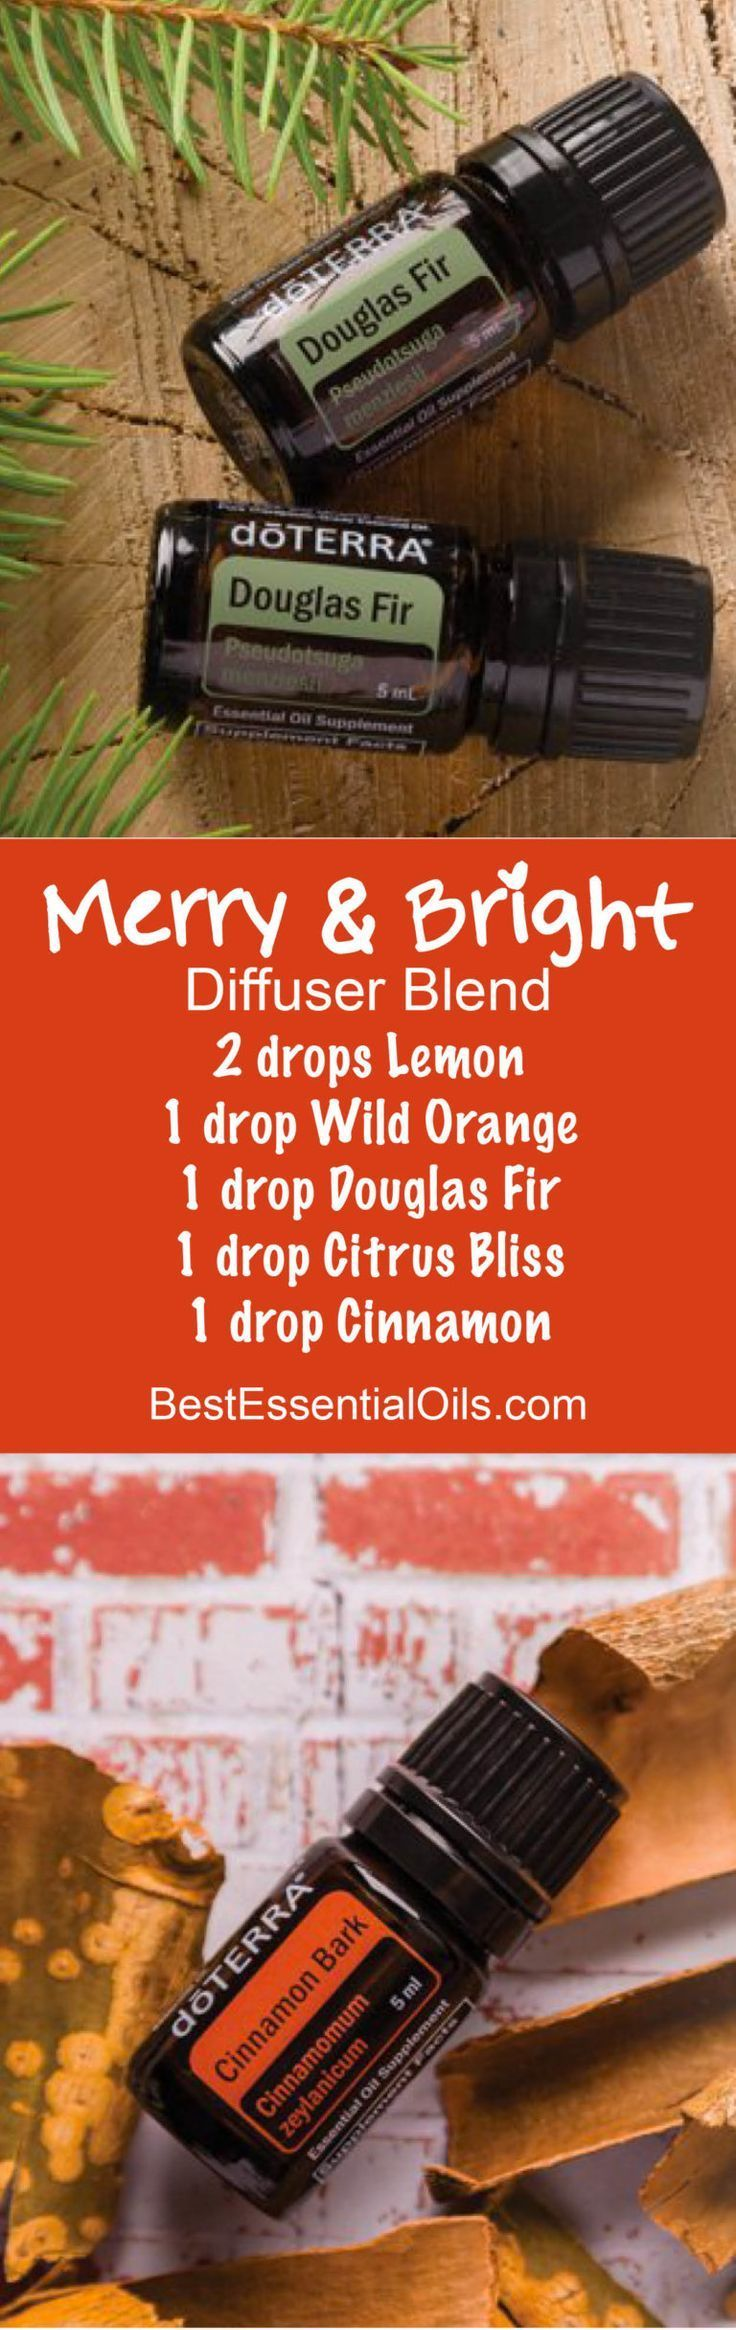 Merry & Bright doTERRA Diffuser Blend